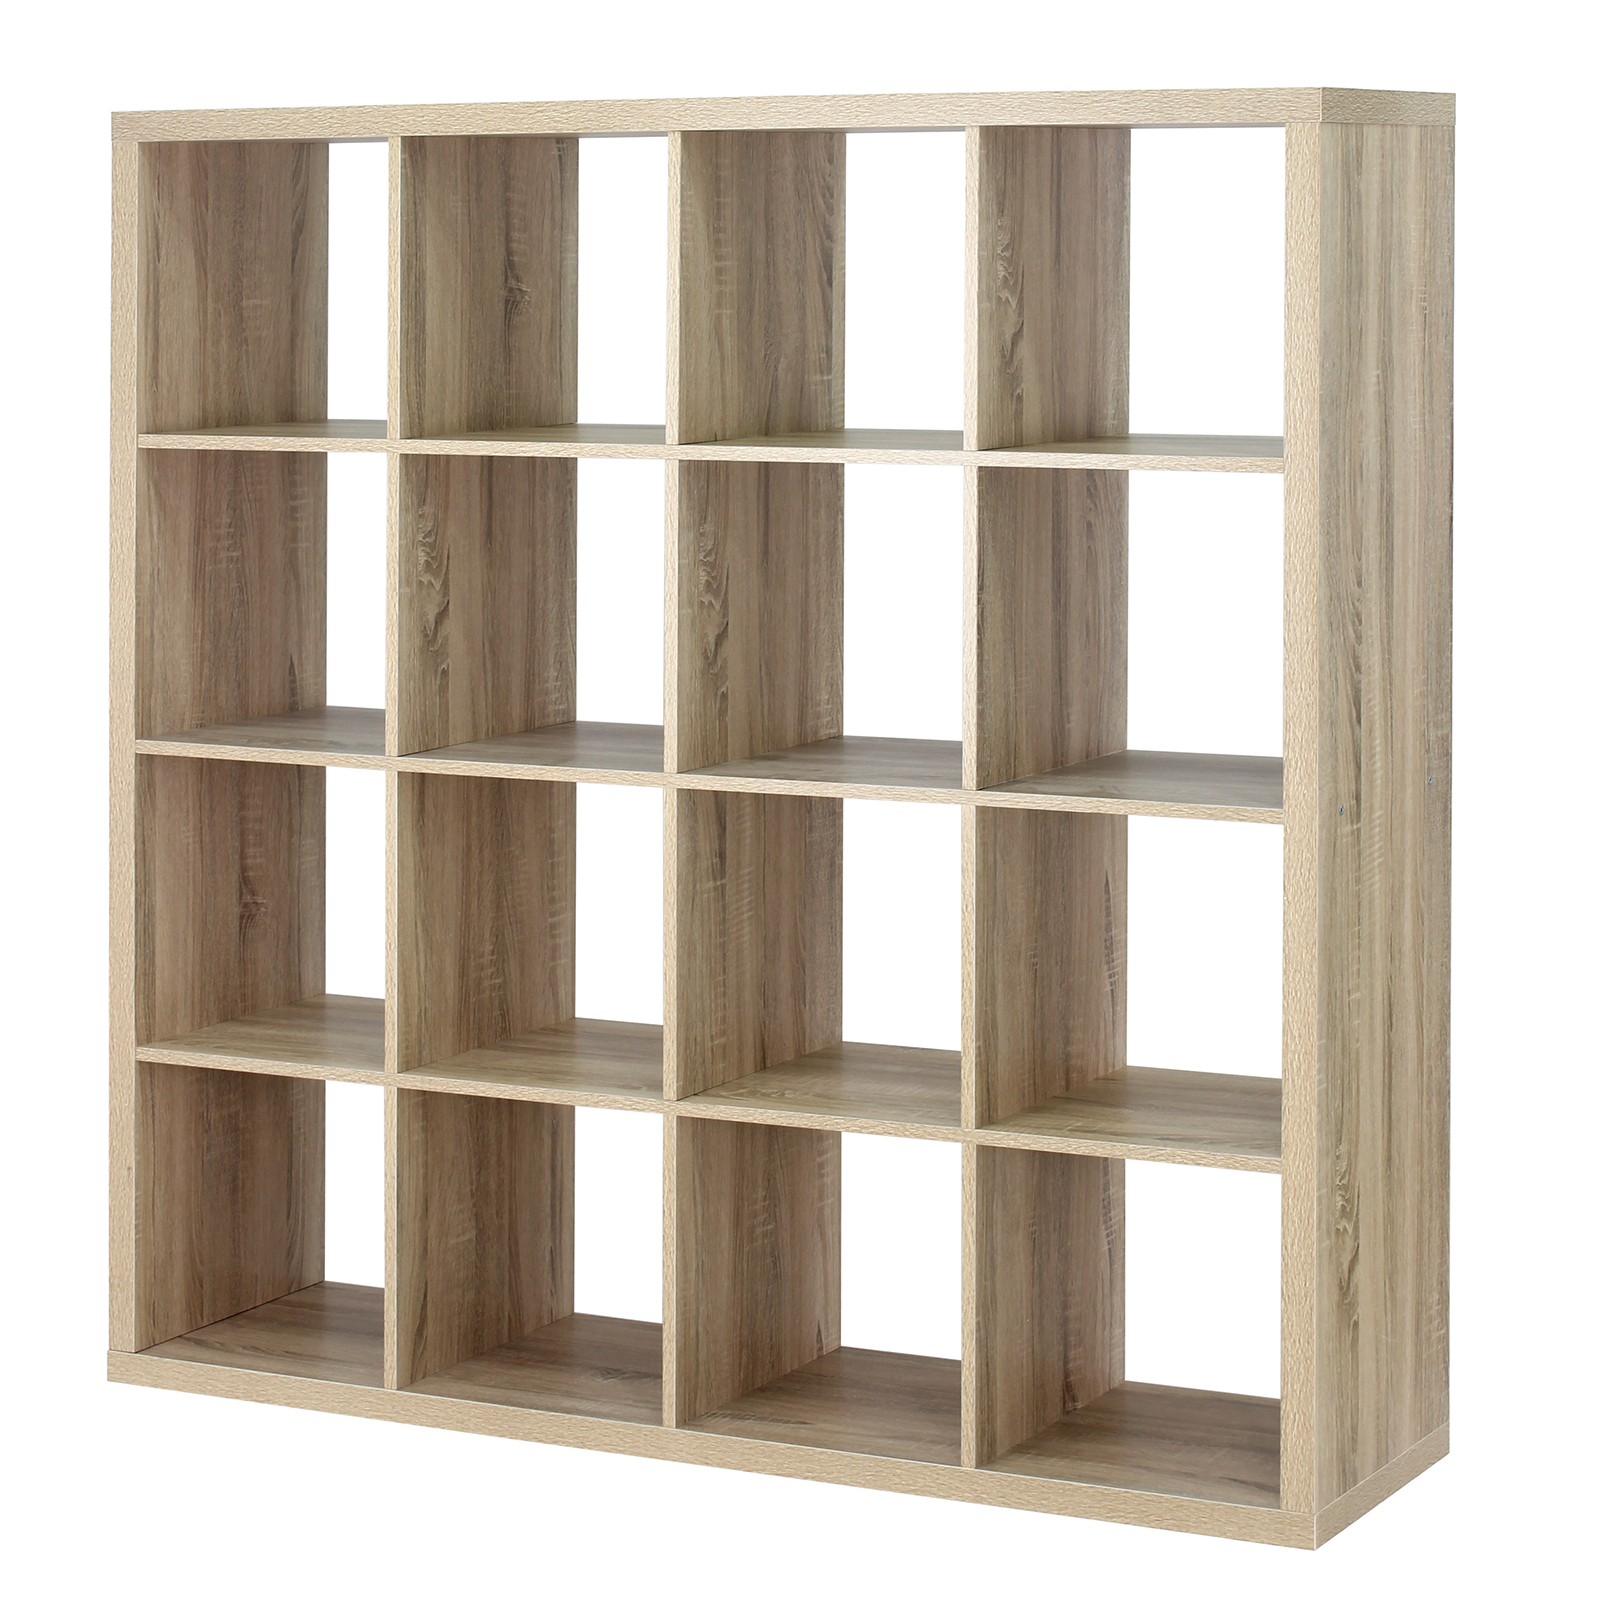 Flexi Storage 146 x 39 x 146cm Clever Cube 4 x 4 Storage Unit - Oak